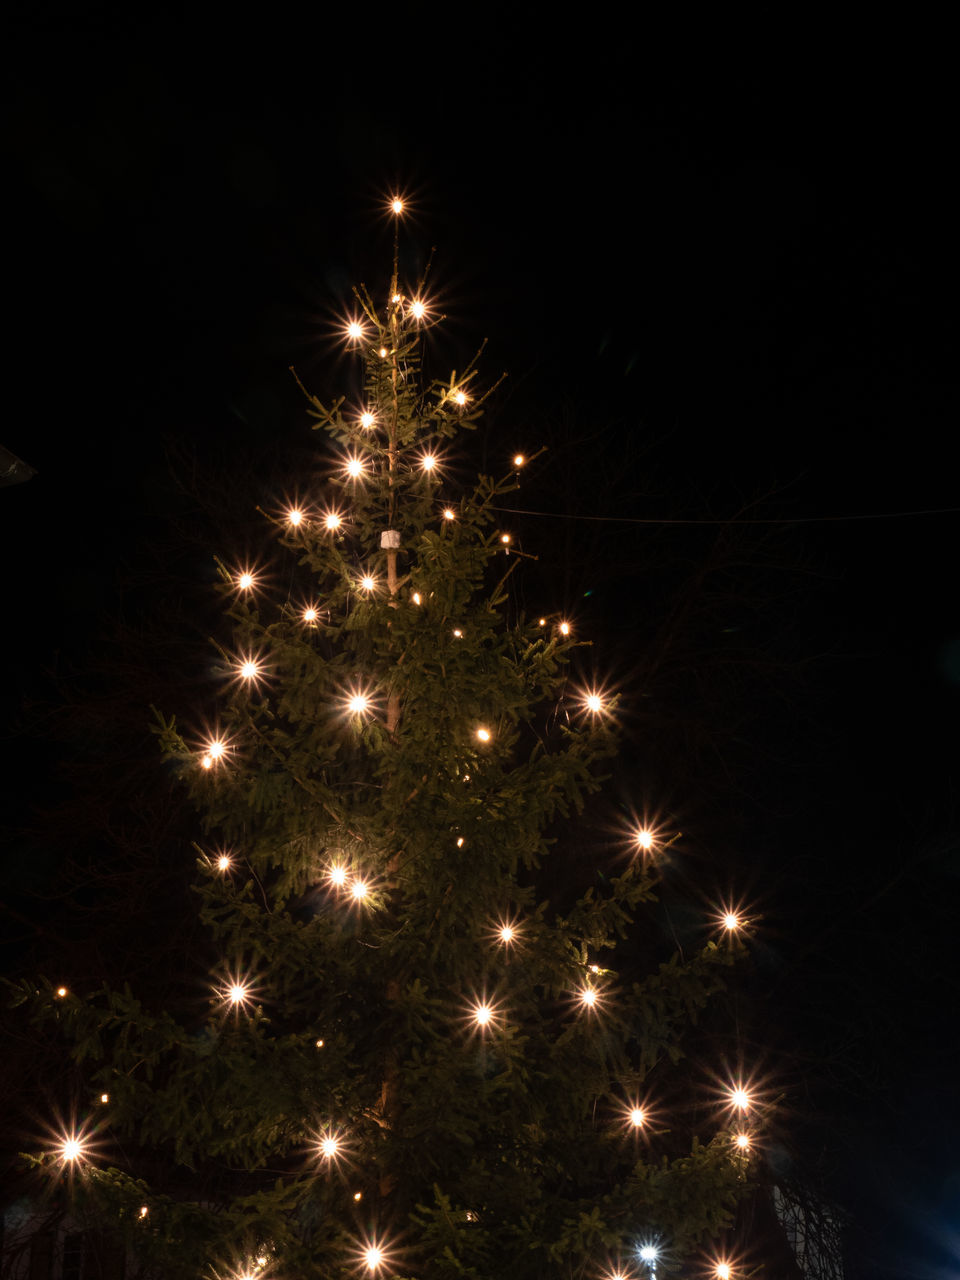 illuminated, celebration, night, decoration, lighting equipment, christmas, no people, glowing, light, christmas lights, holiday, tree, christmas decoration, christmas tree, nature, low angle view, plant, event, sky, christmas ornament